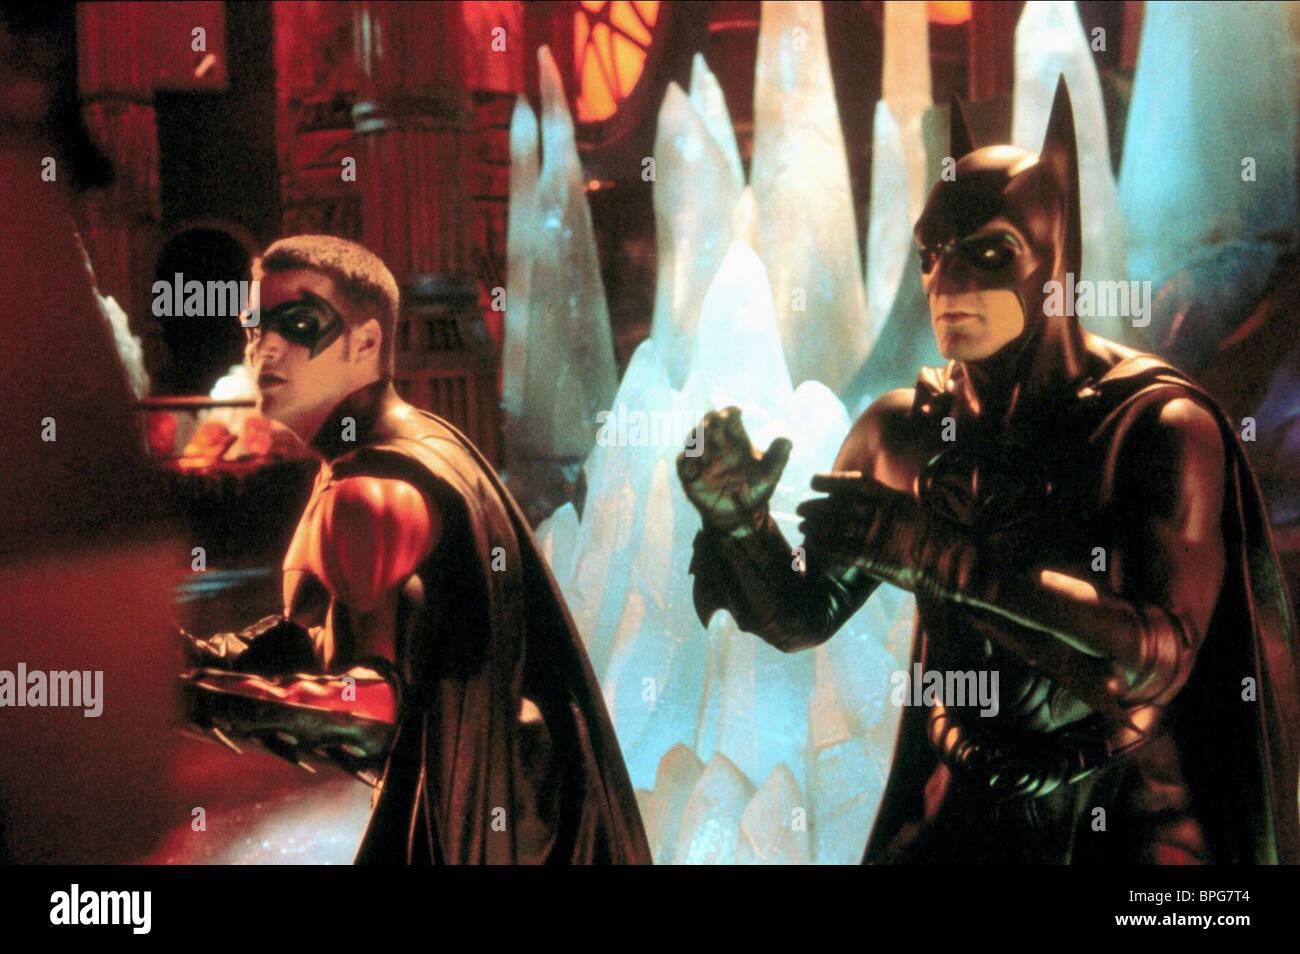 Chris O Donnell George Clooney Batman Robin 1997 Stock Photo Alamy